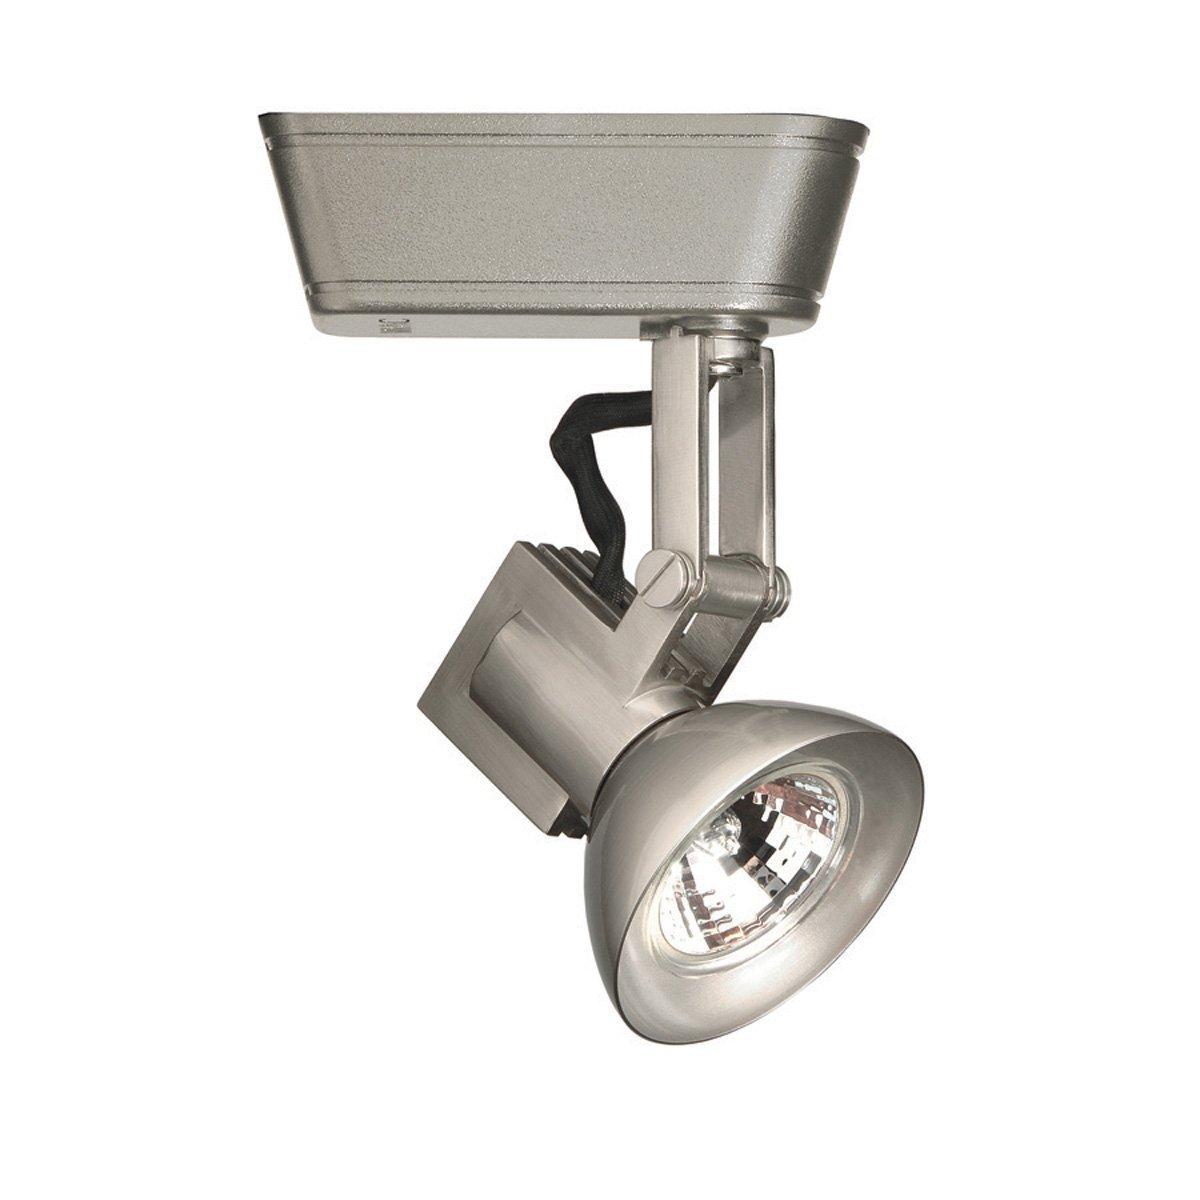 WAC Lighting JHT-856-BN Low Voltage Track Fixture, Brushed Nickel